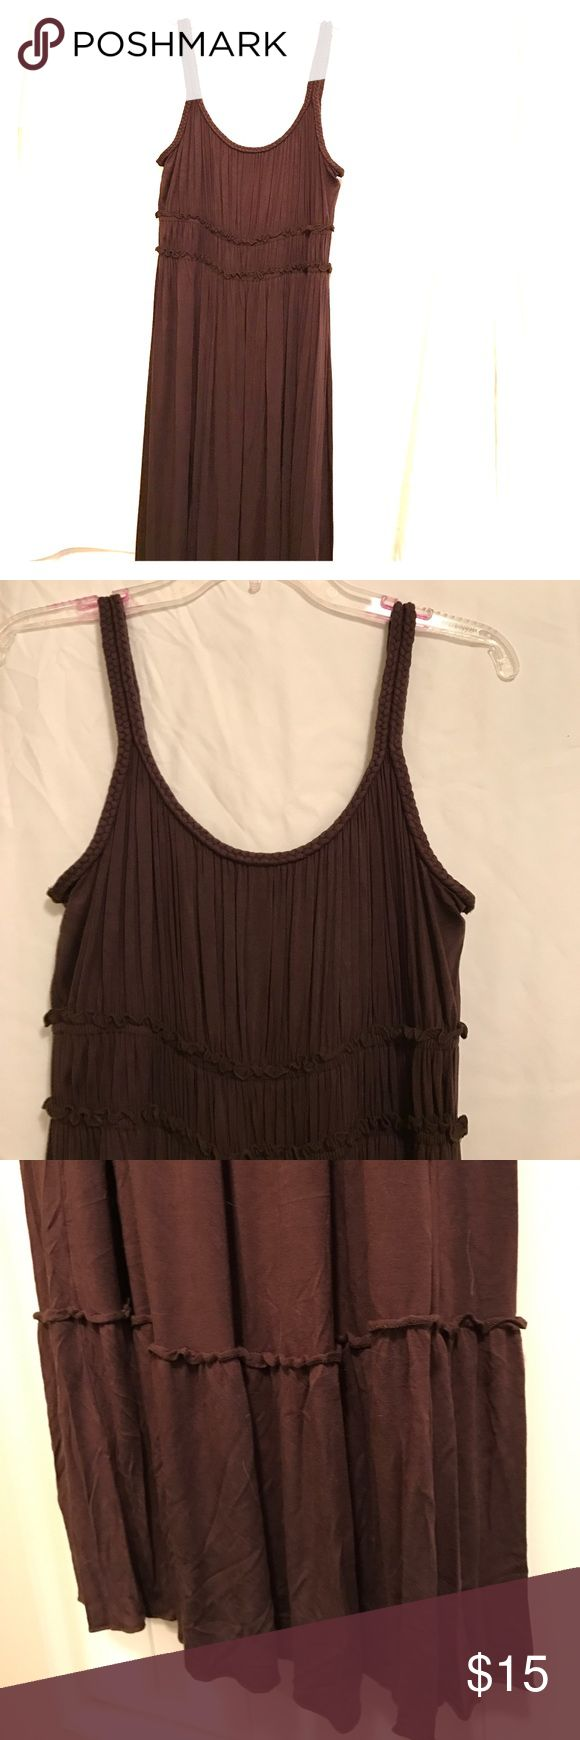 Brown Maxi Dress Super cute brown Maxi dress with braided straps Spense Dresses Maxi